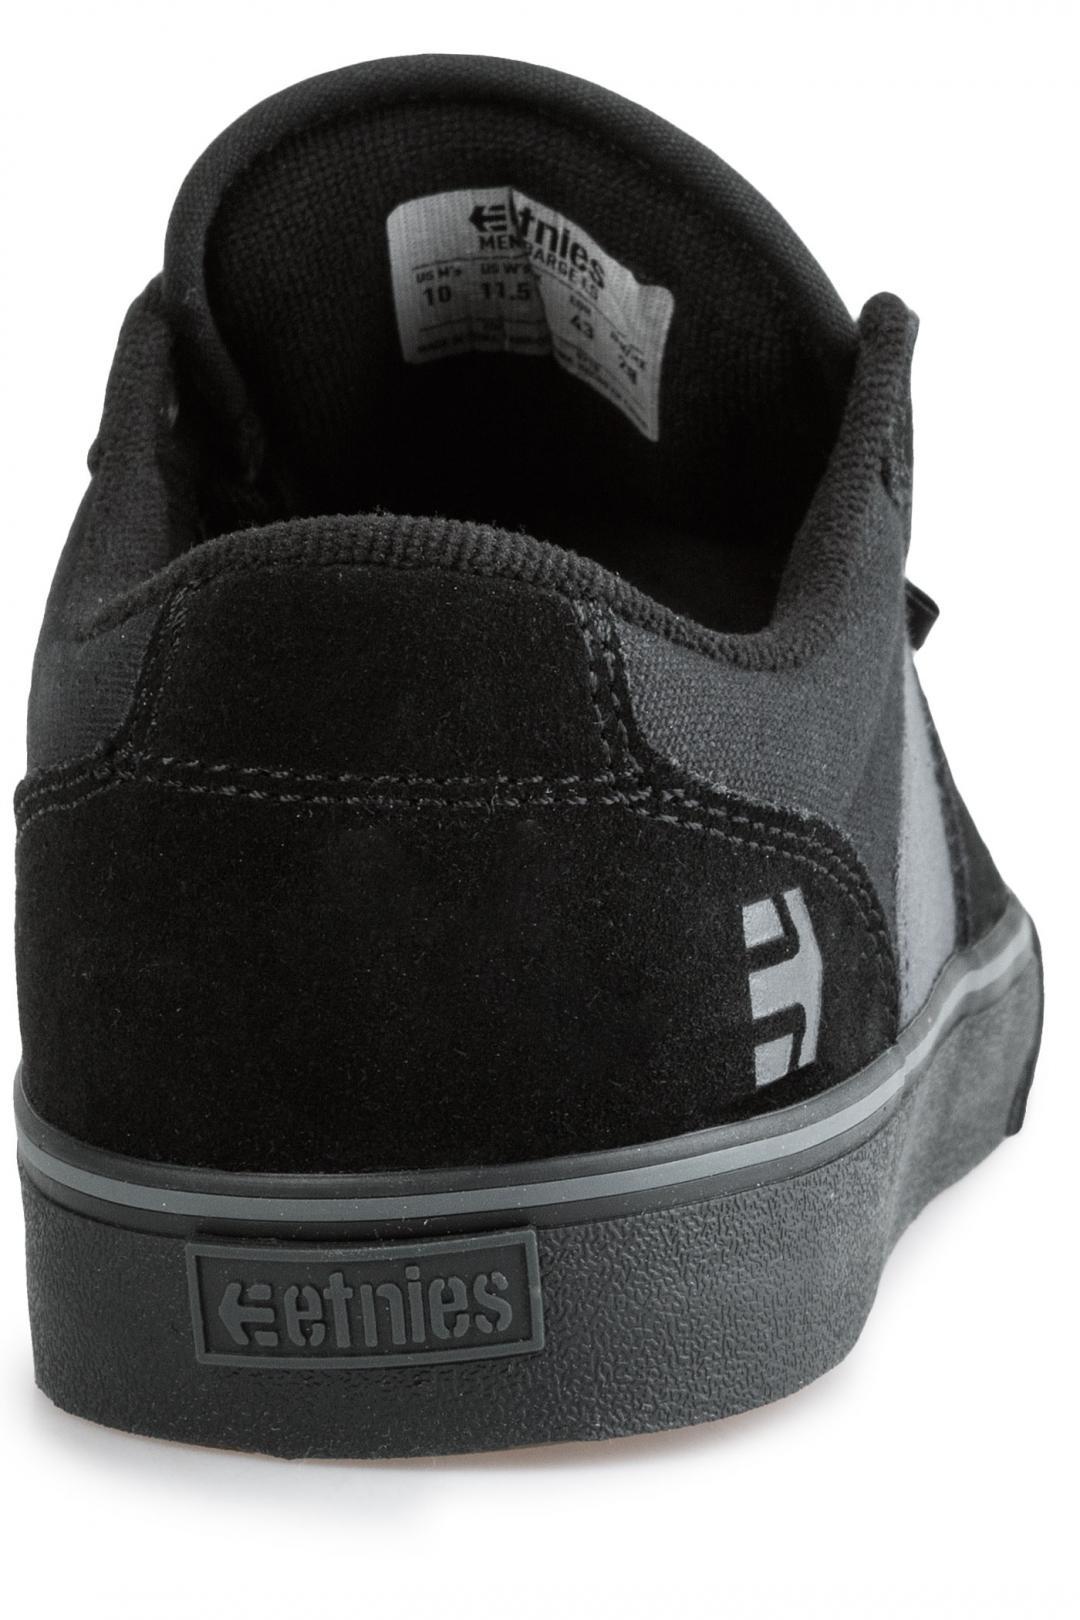 Uomo Etnies Barge LS black grey black | Sneaker